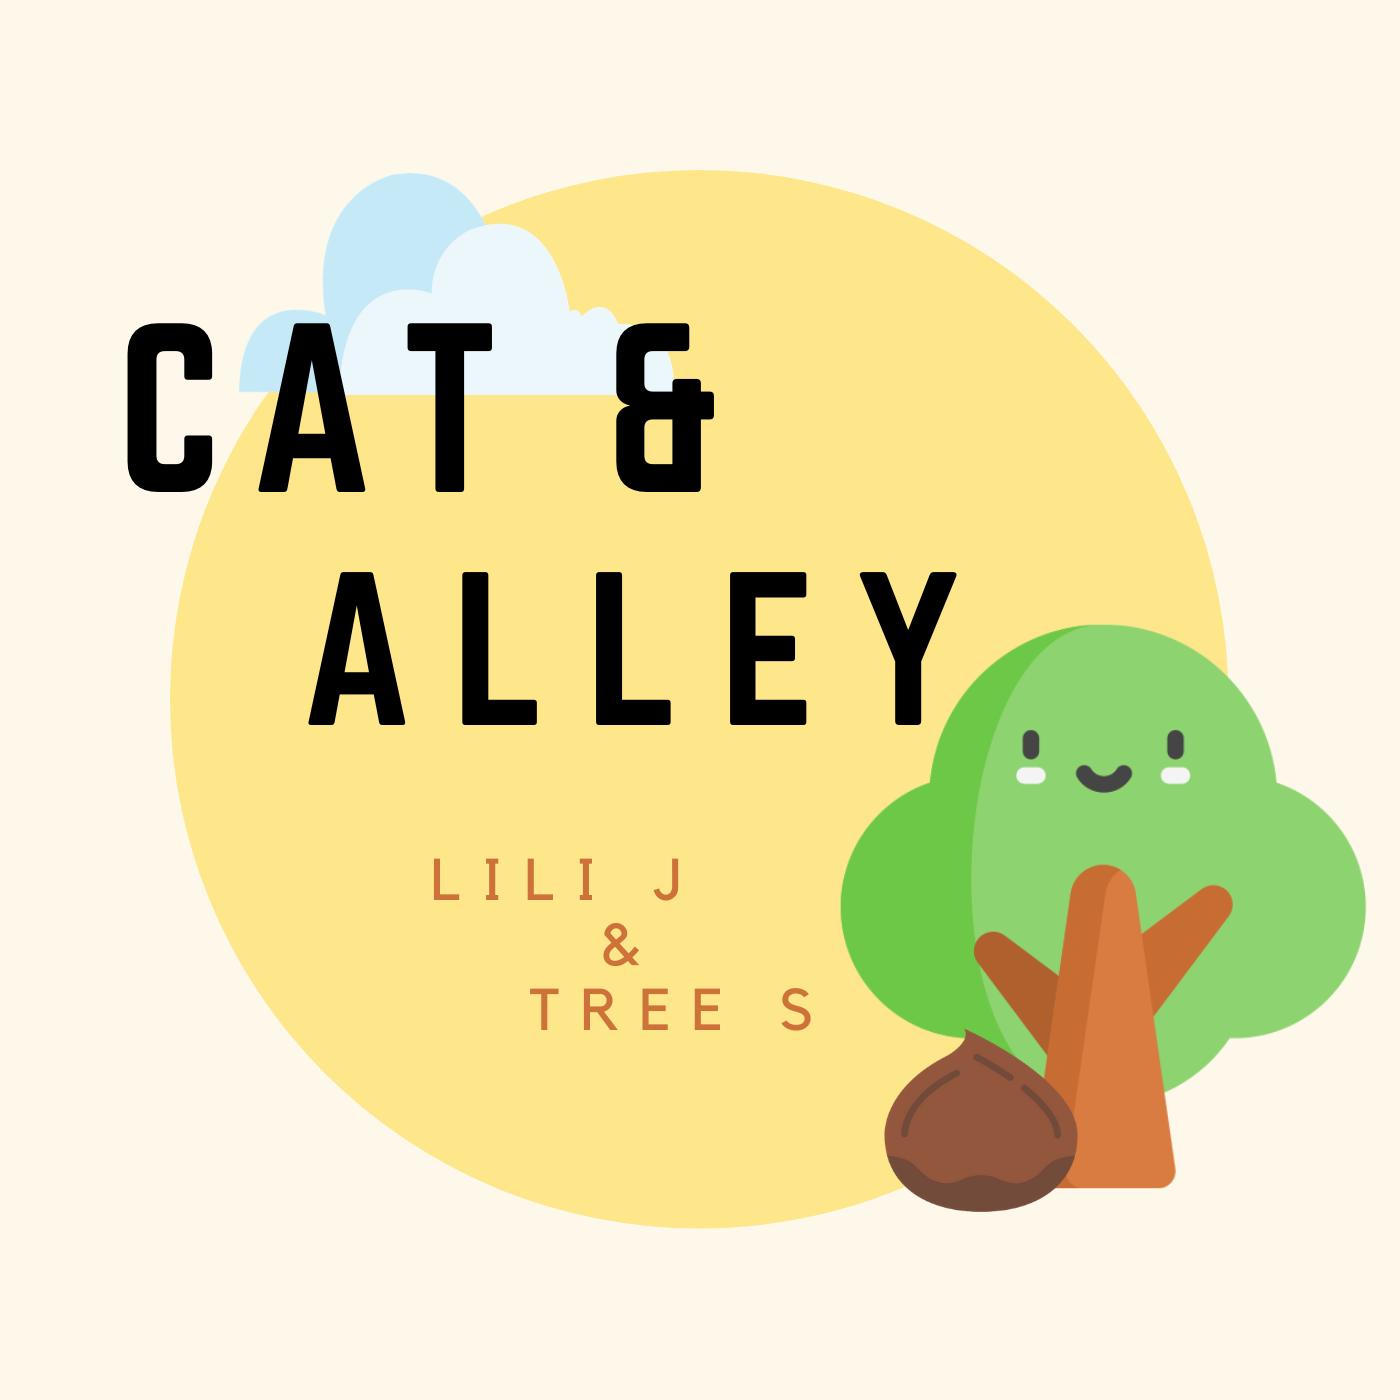 Cat & Alley